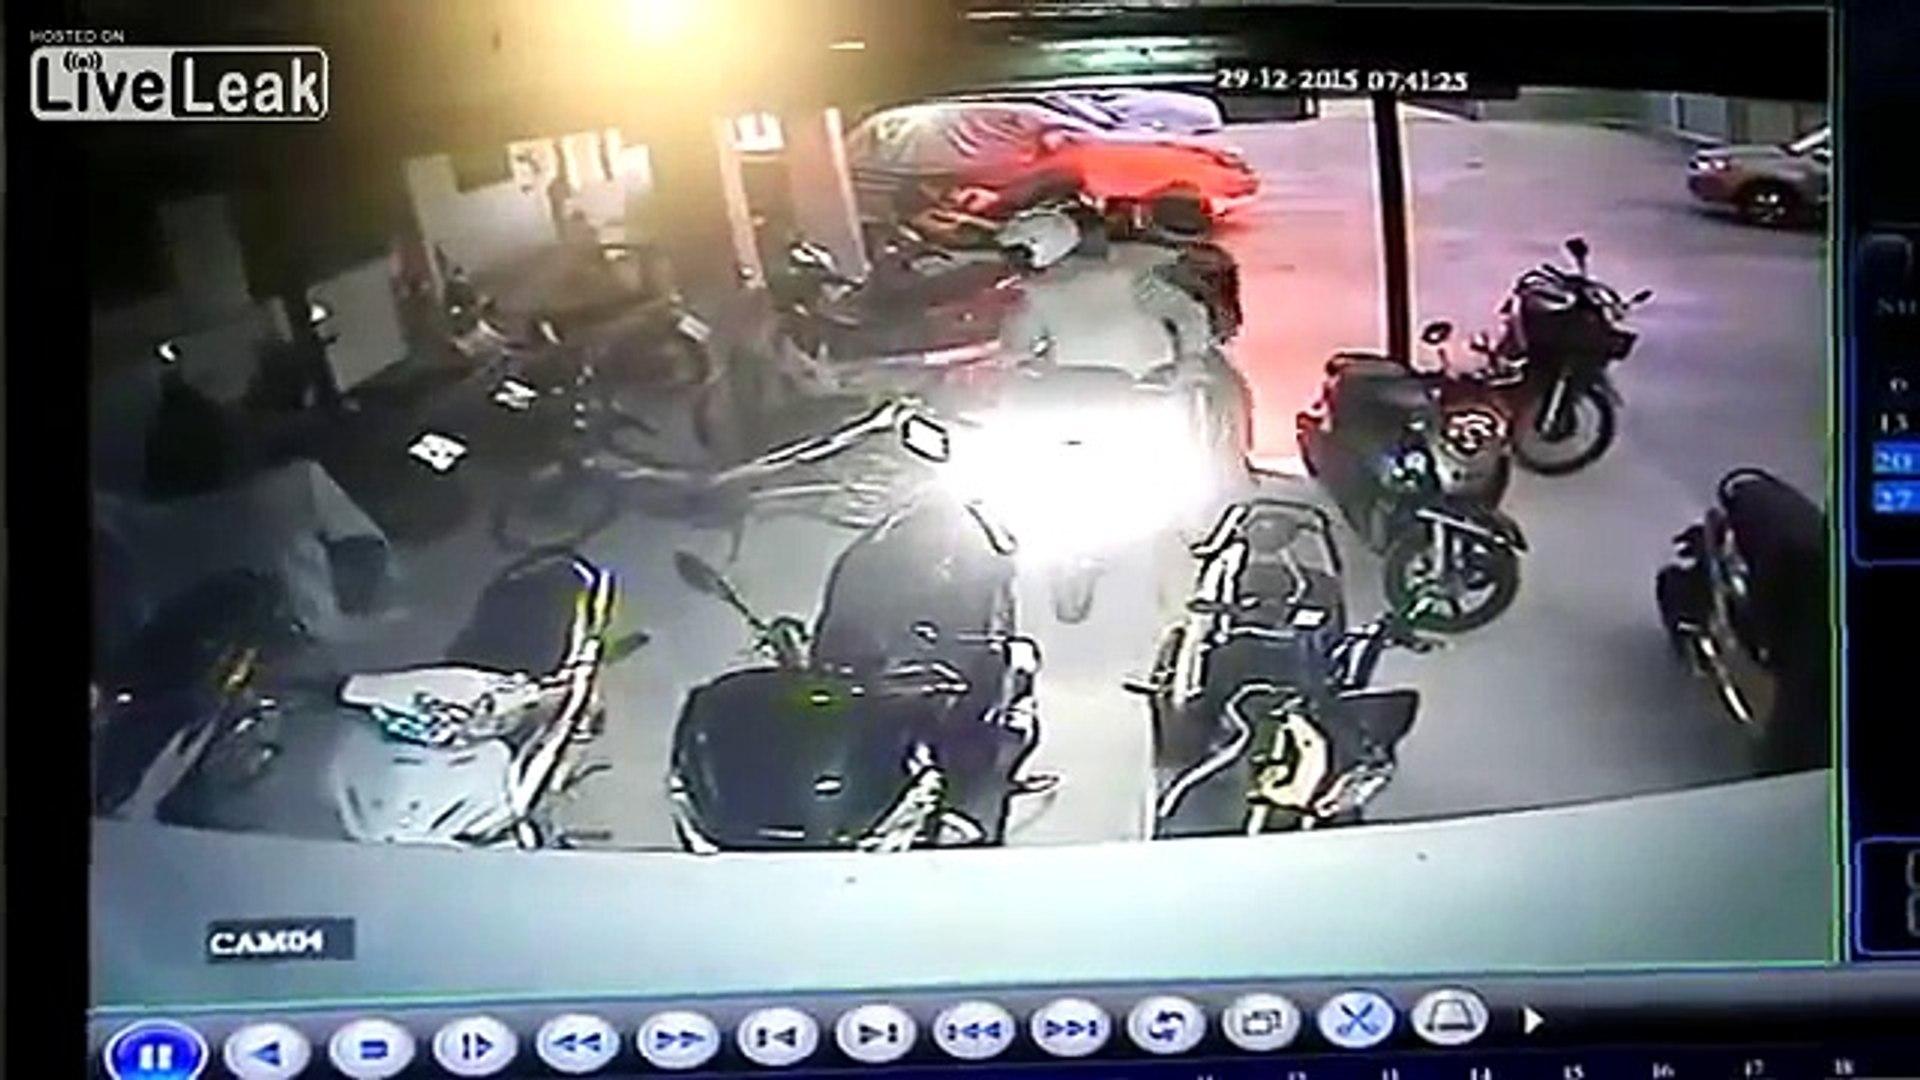 LiveLeak - Motorcycle thief get shot in the Spine